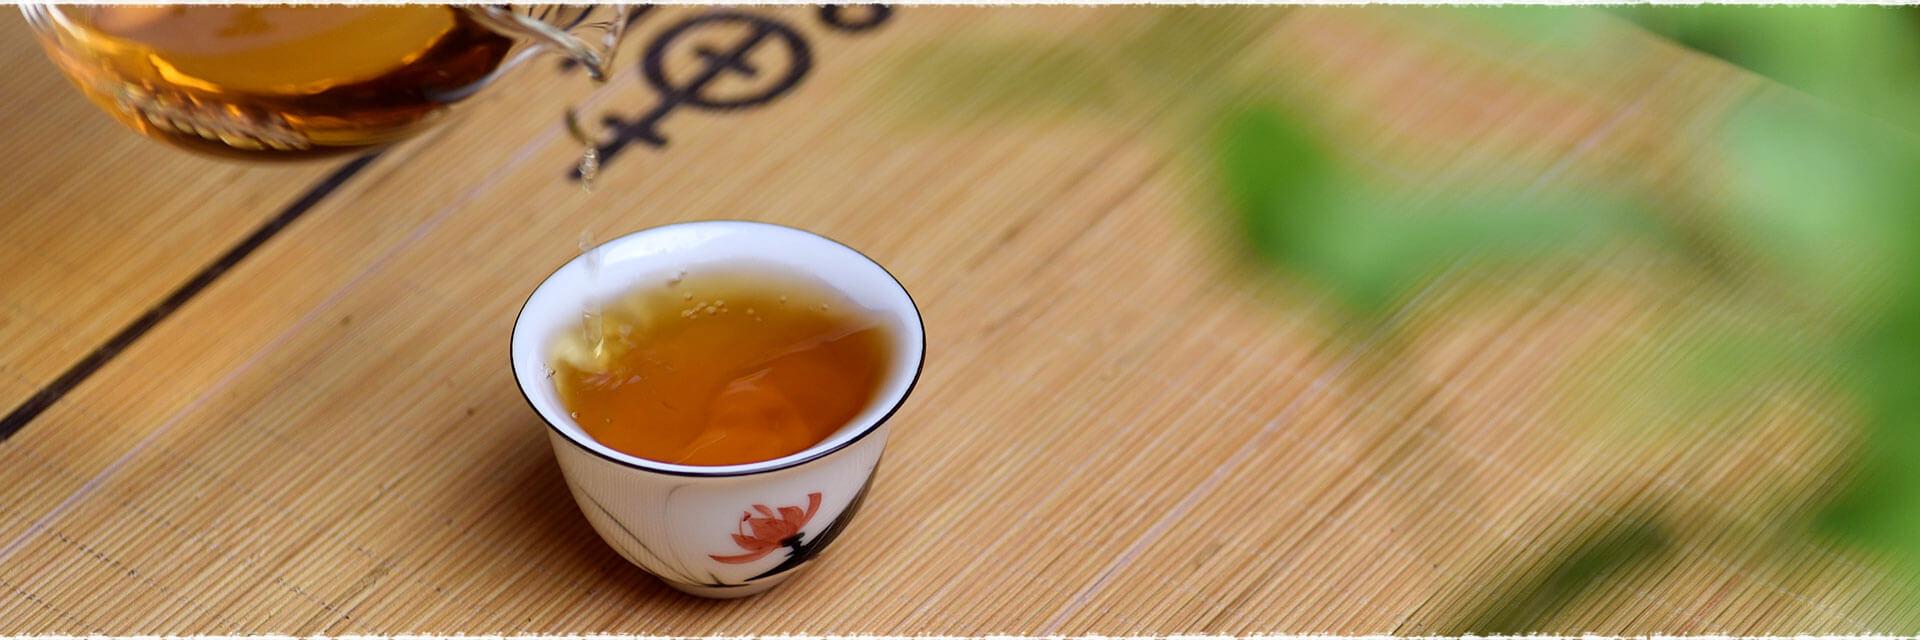 Magret de canard sauce au thé noir BaiLingGongFu.